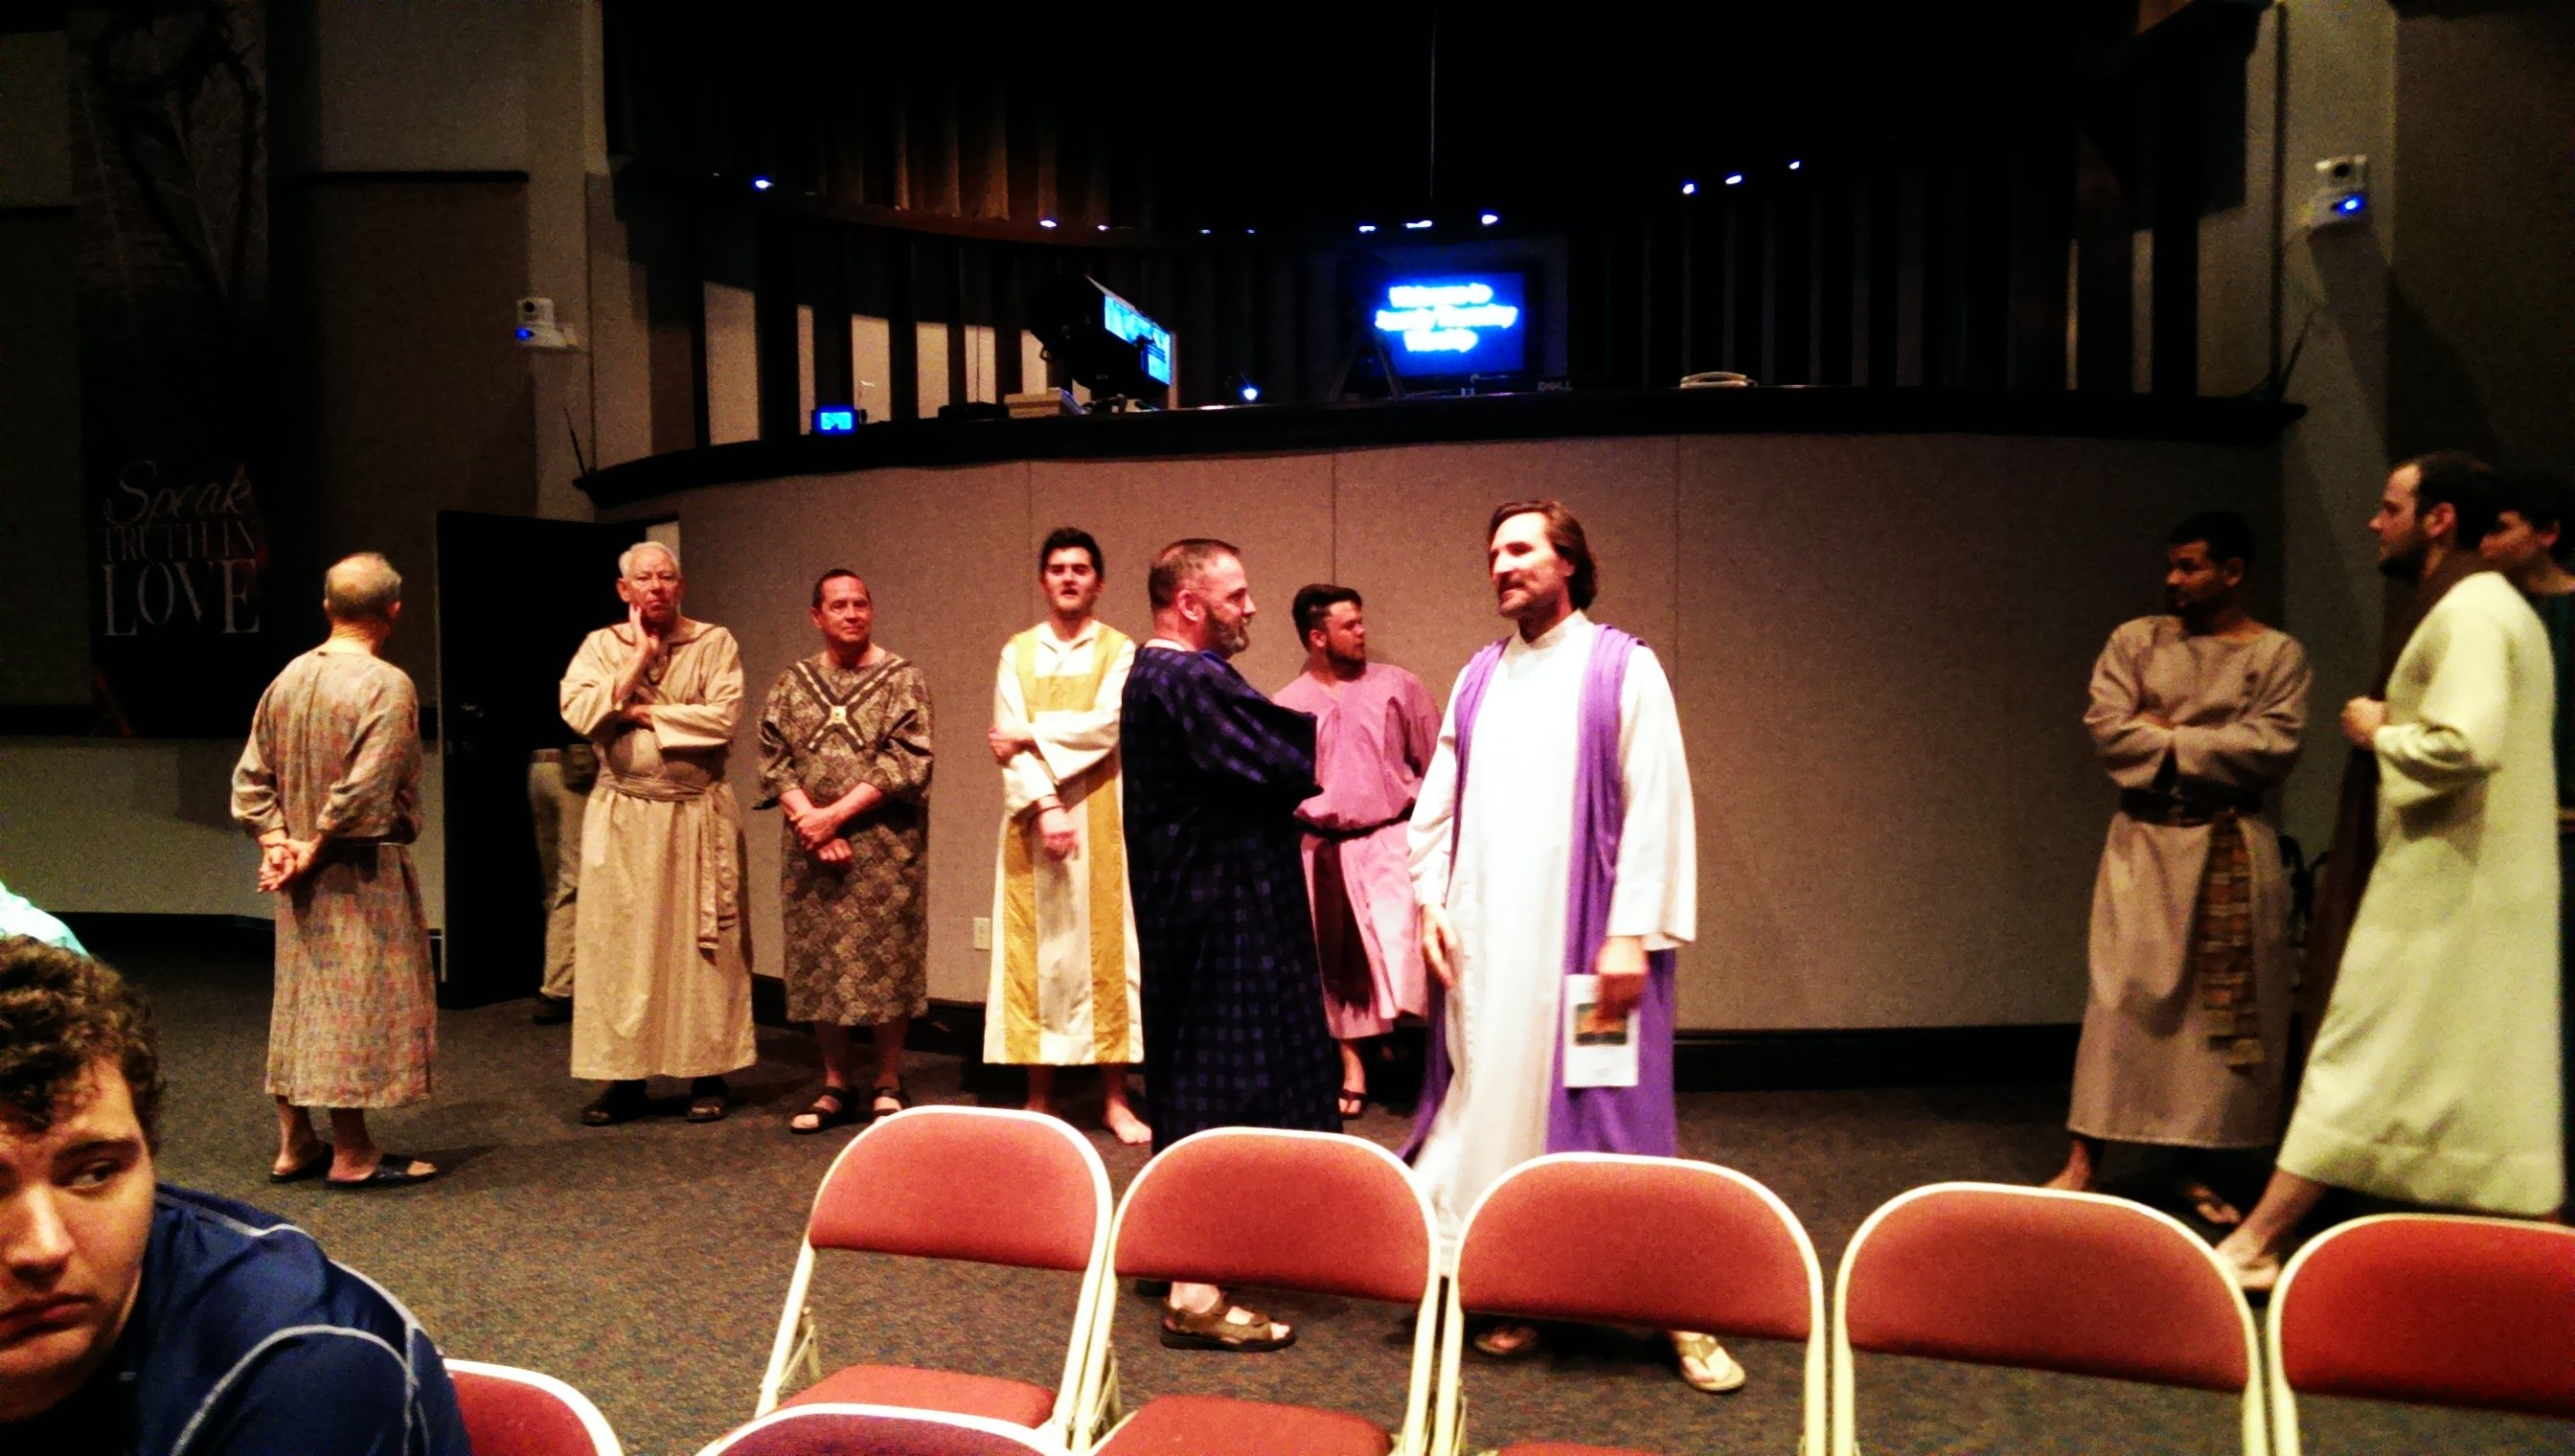 #disciple #lastsupper #maundythursday